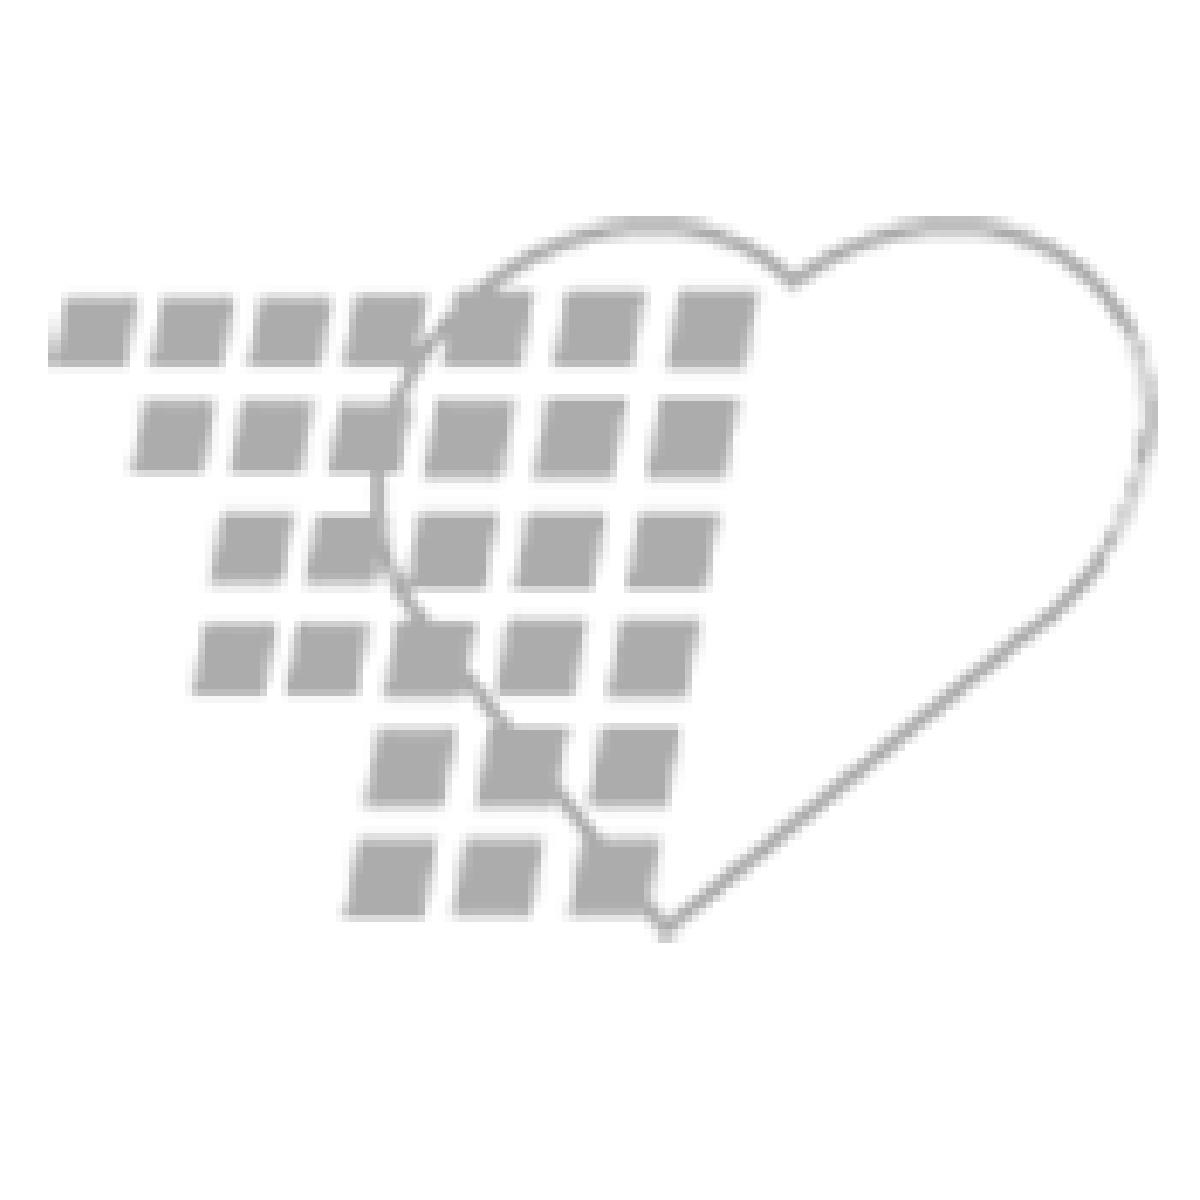 08-56-0411-32OZ - Kendall   Solution Bowl - 32 oz